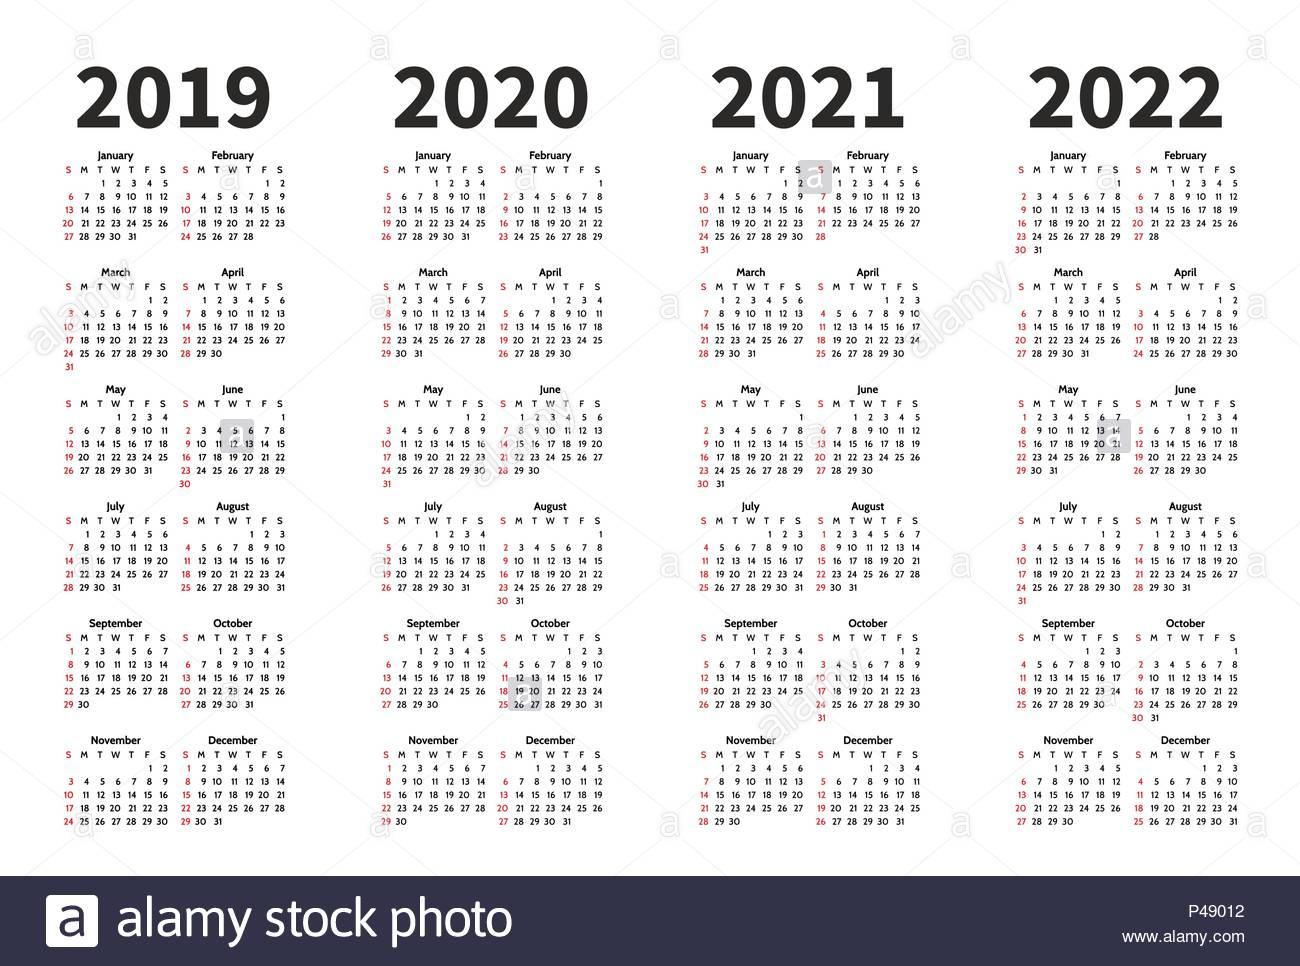 Calendar 2021 Stock Photos & Calendar 2021 Stock Images